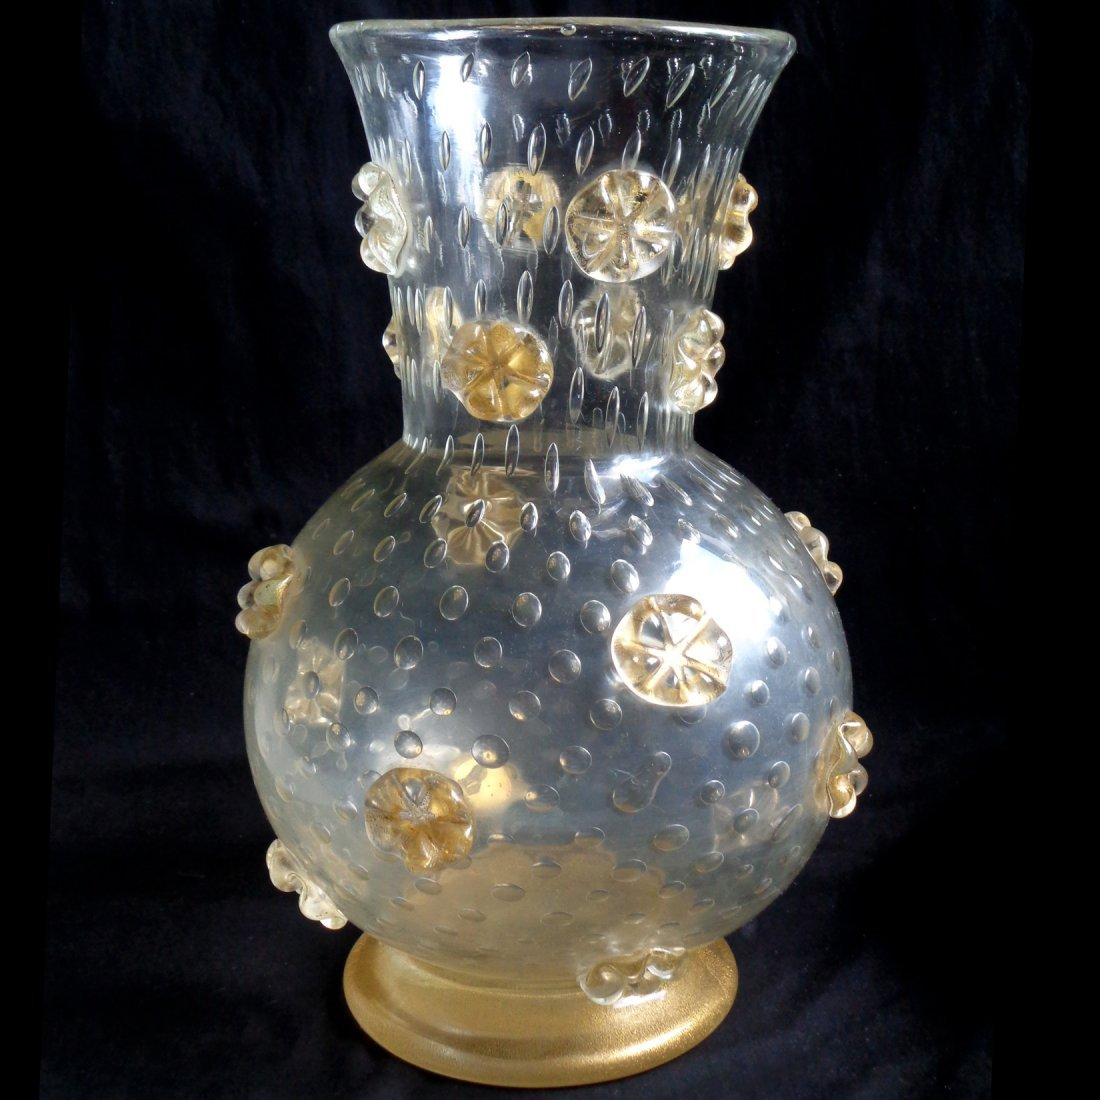 Ercole Barovier Murano A Stelle Gold Stars Flower Vase